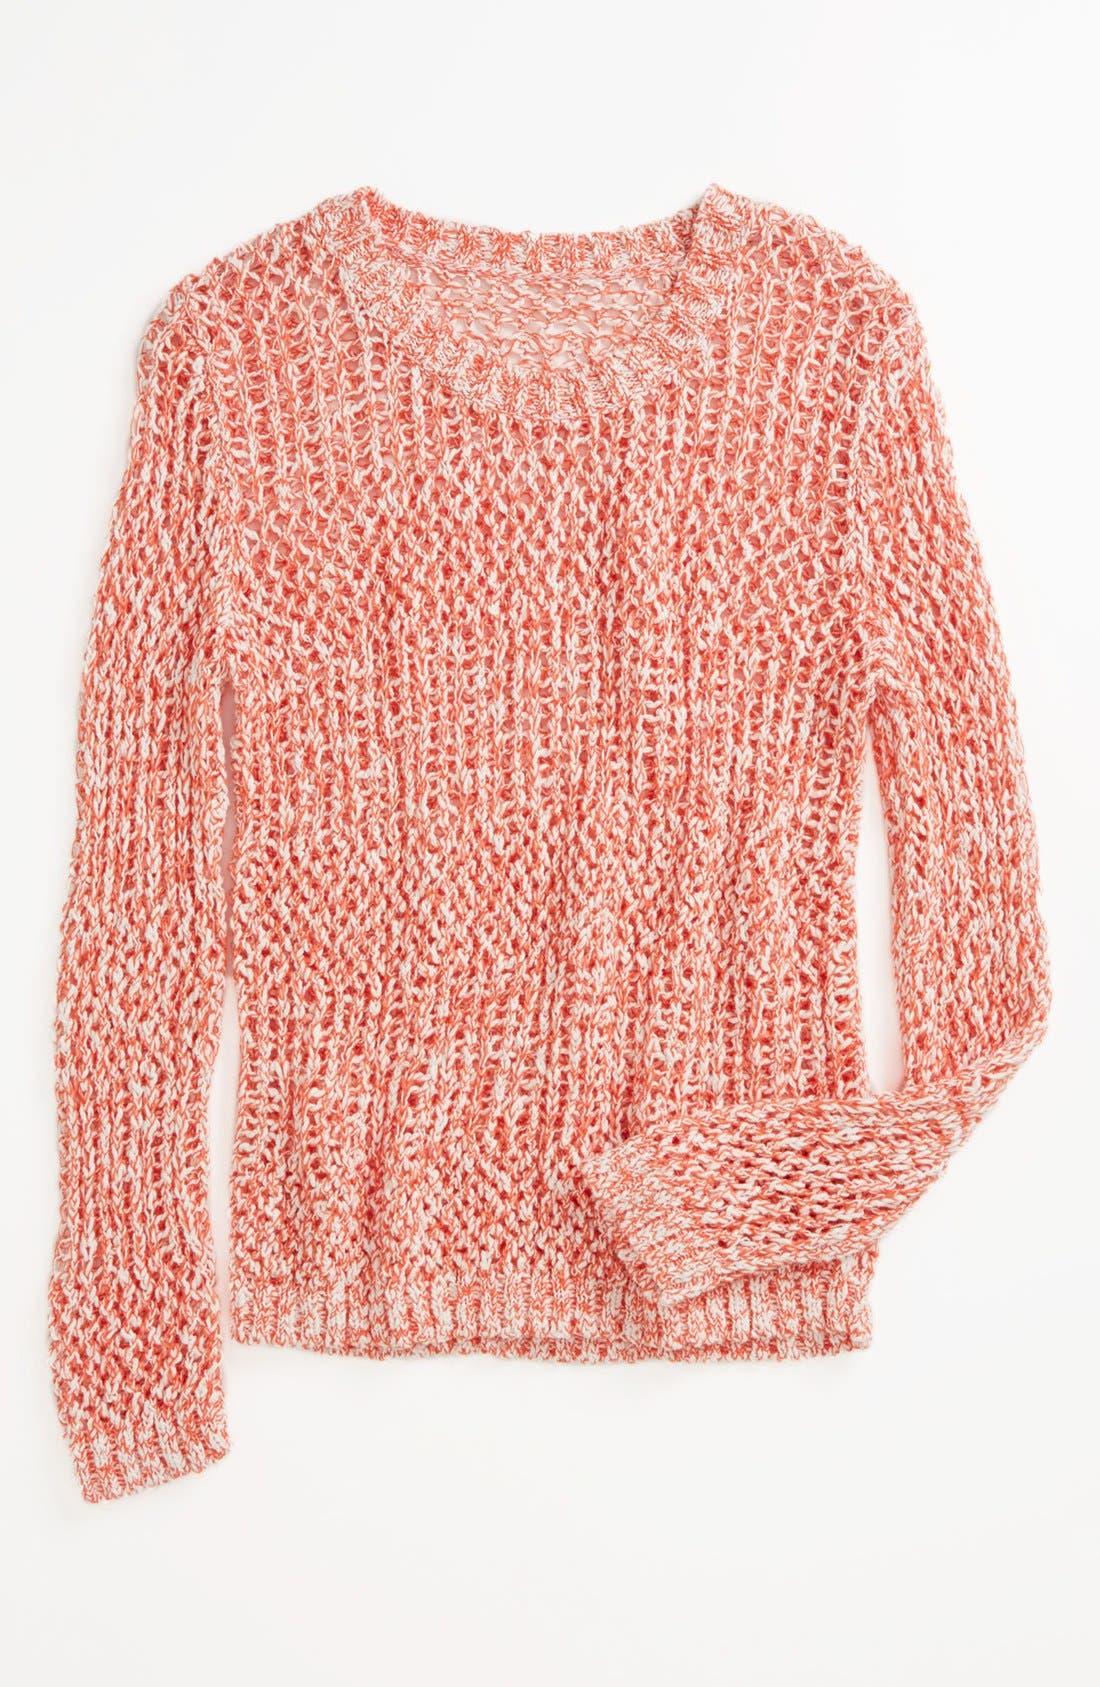 Alternate Image 1 Selected - Tucker + Tate 'Tatiana' Sweater (Big Girls)